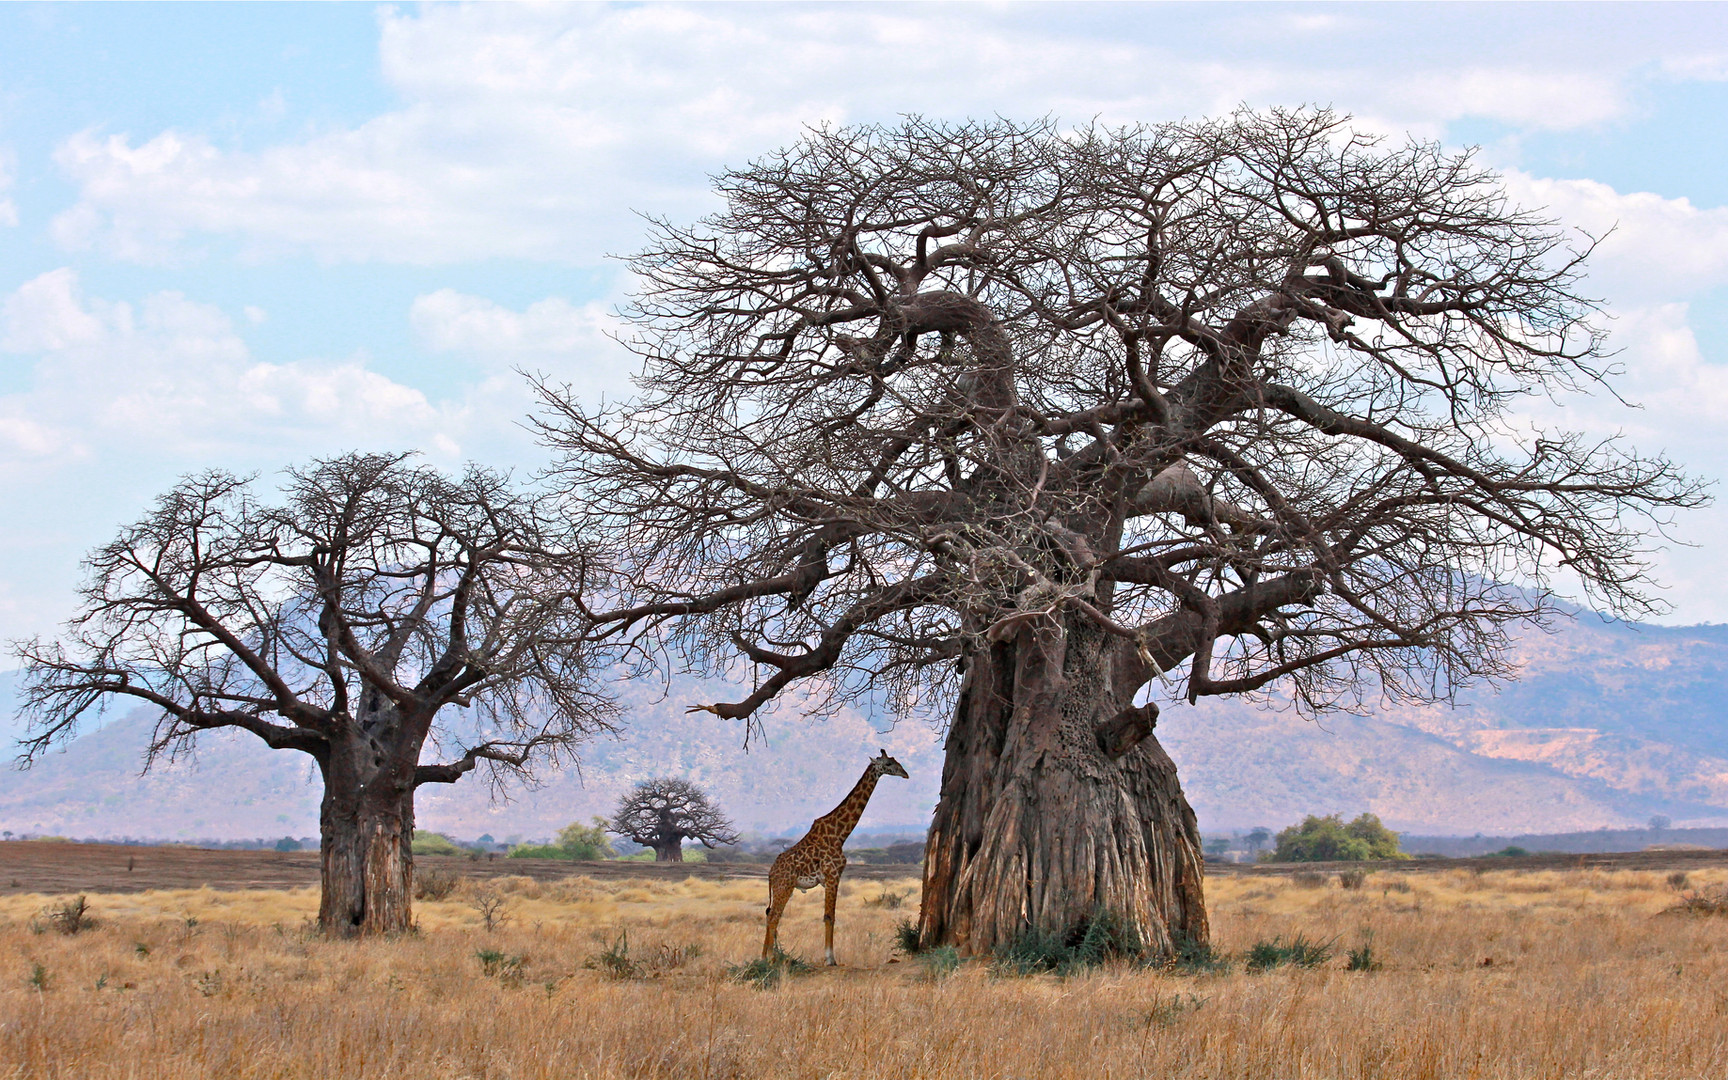 Dwarfed Giraffe